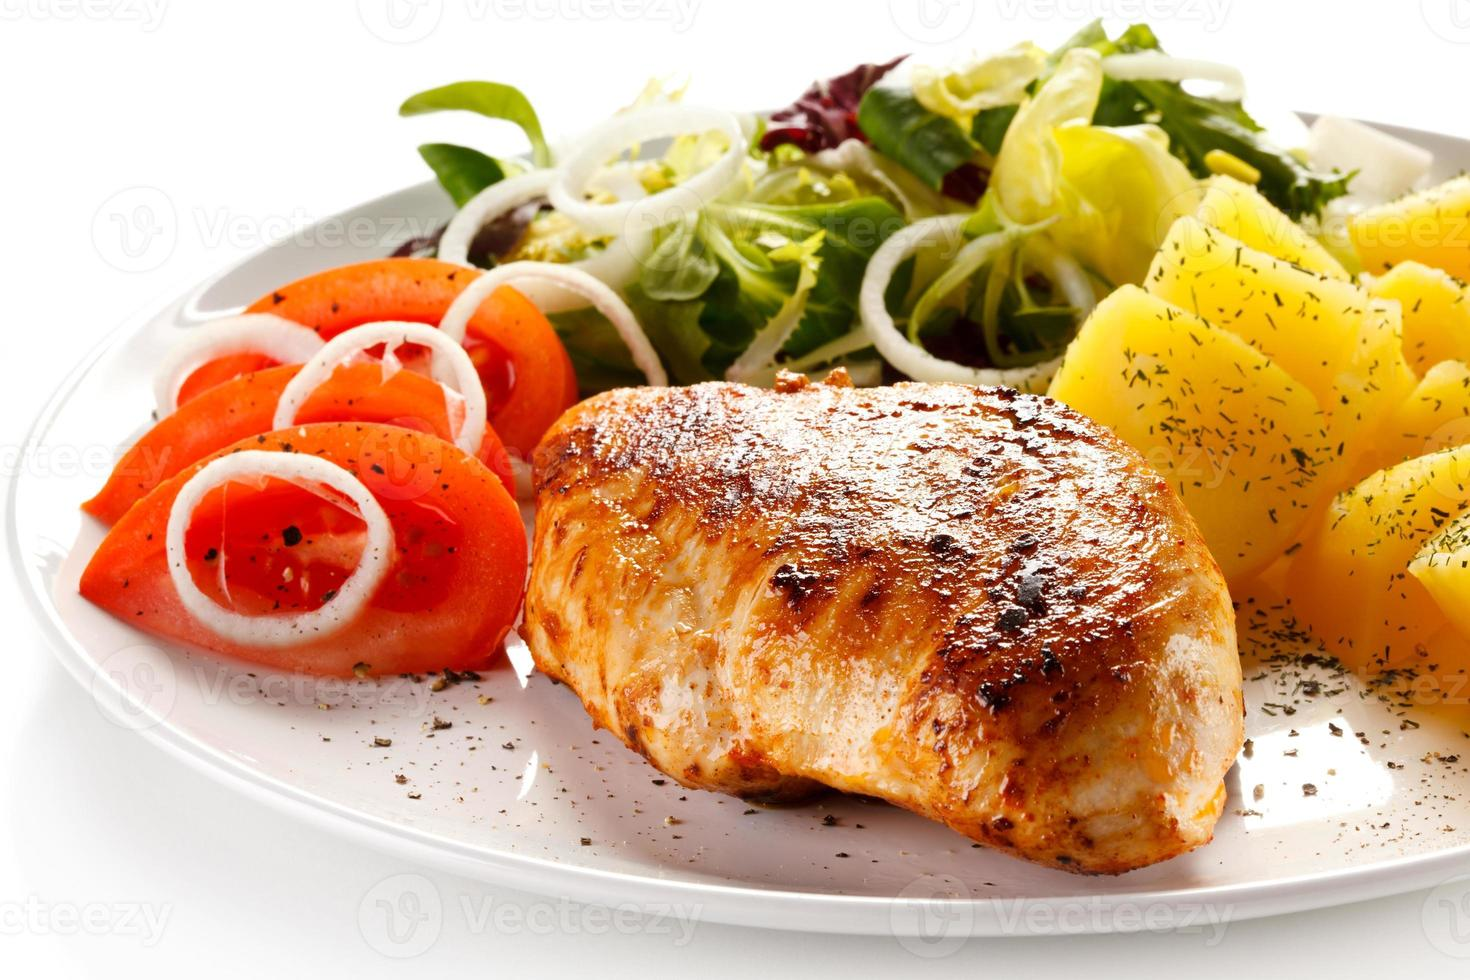 filete, papas hervidas y verduras foto